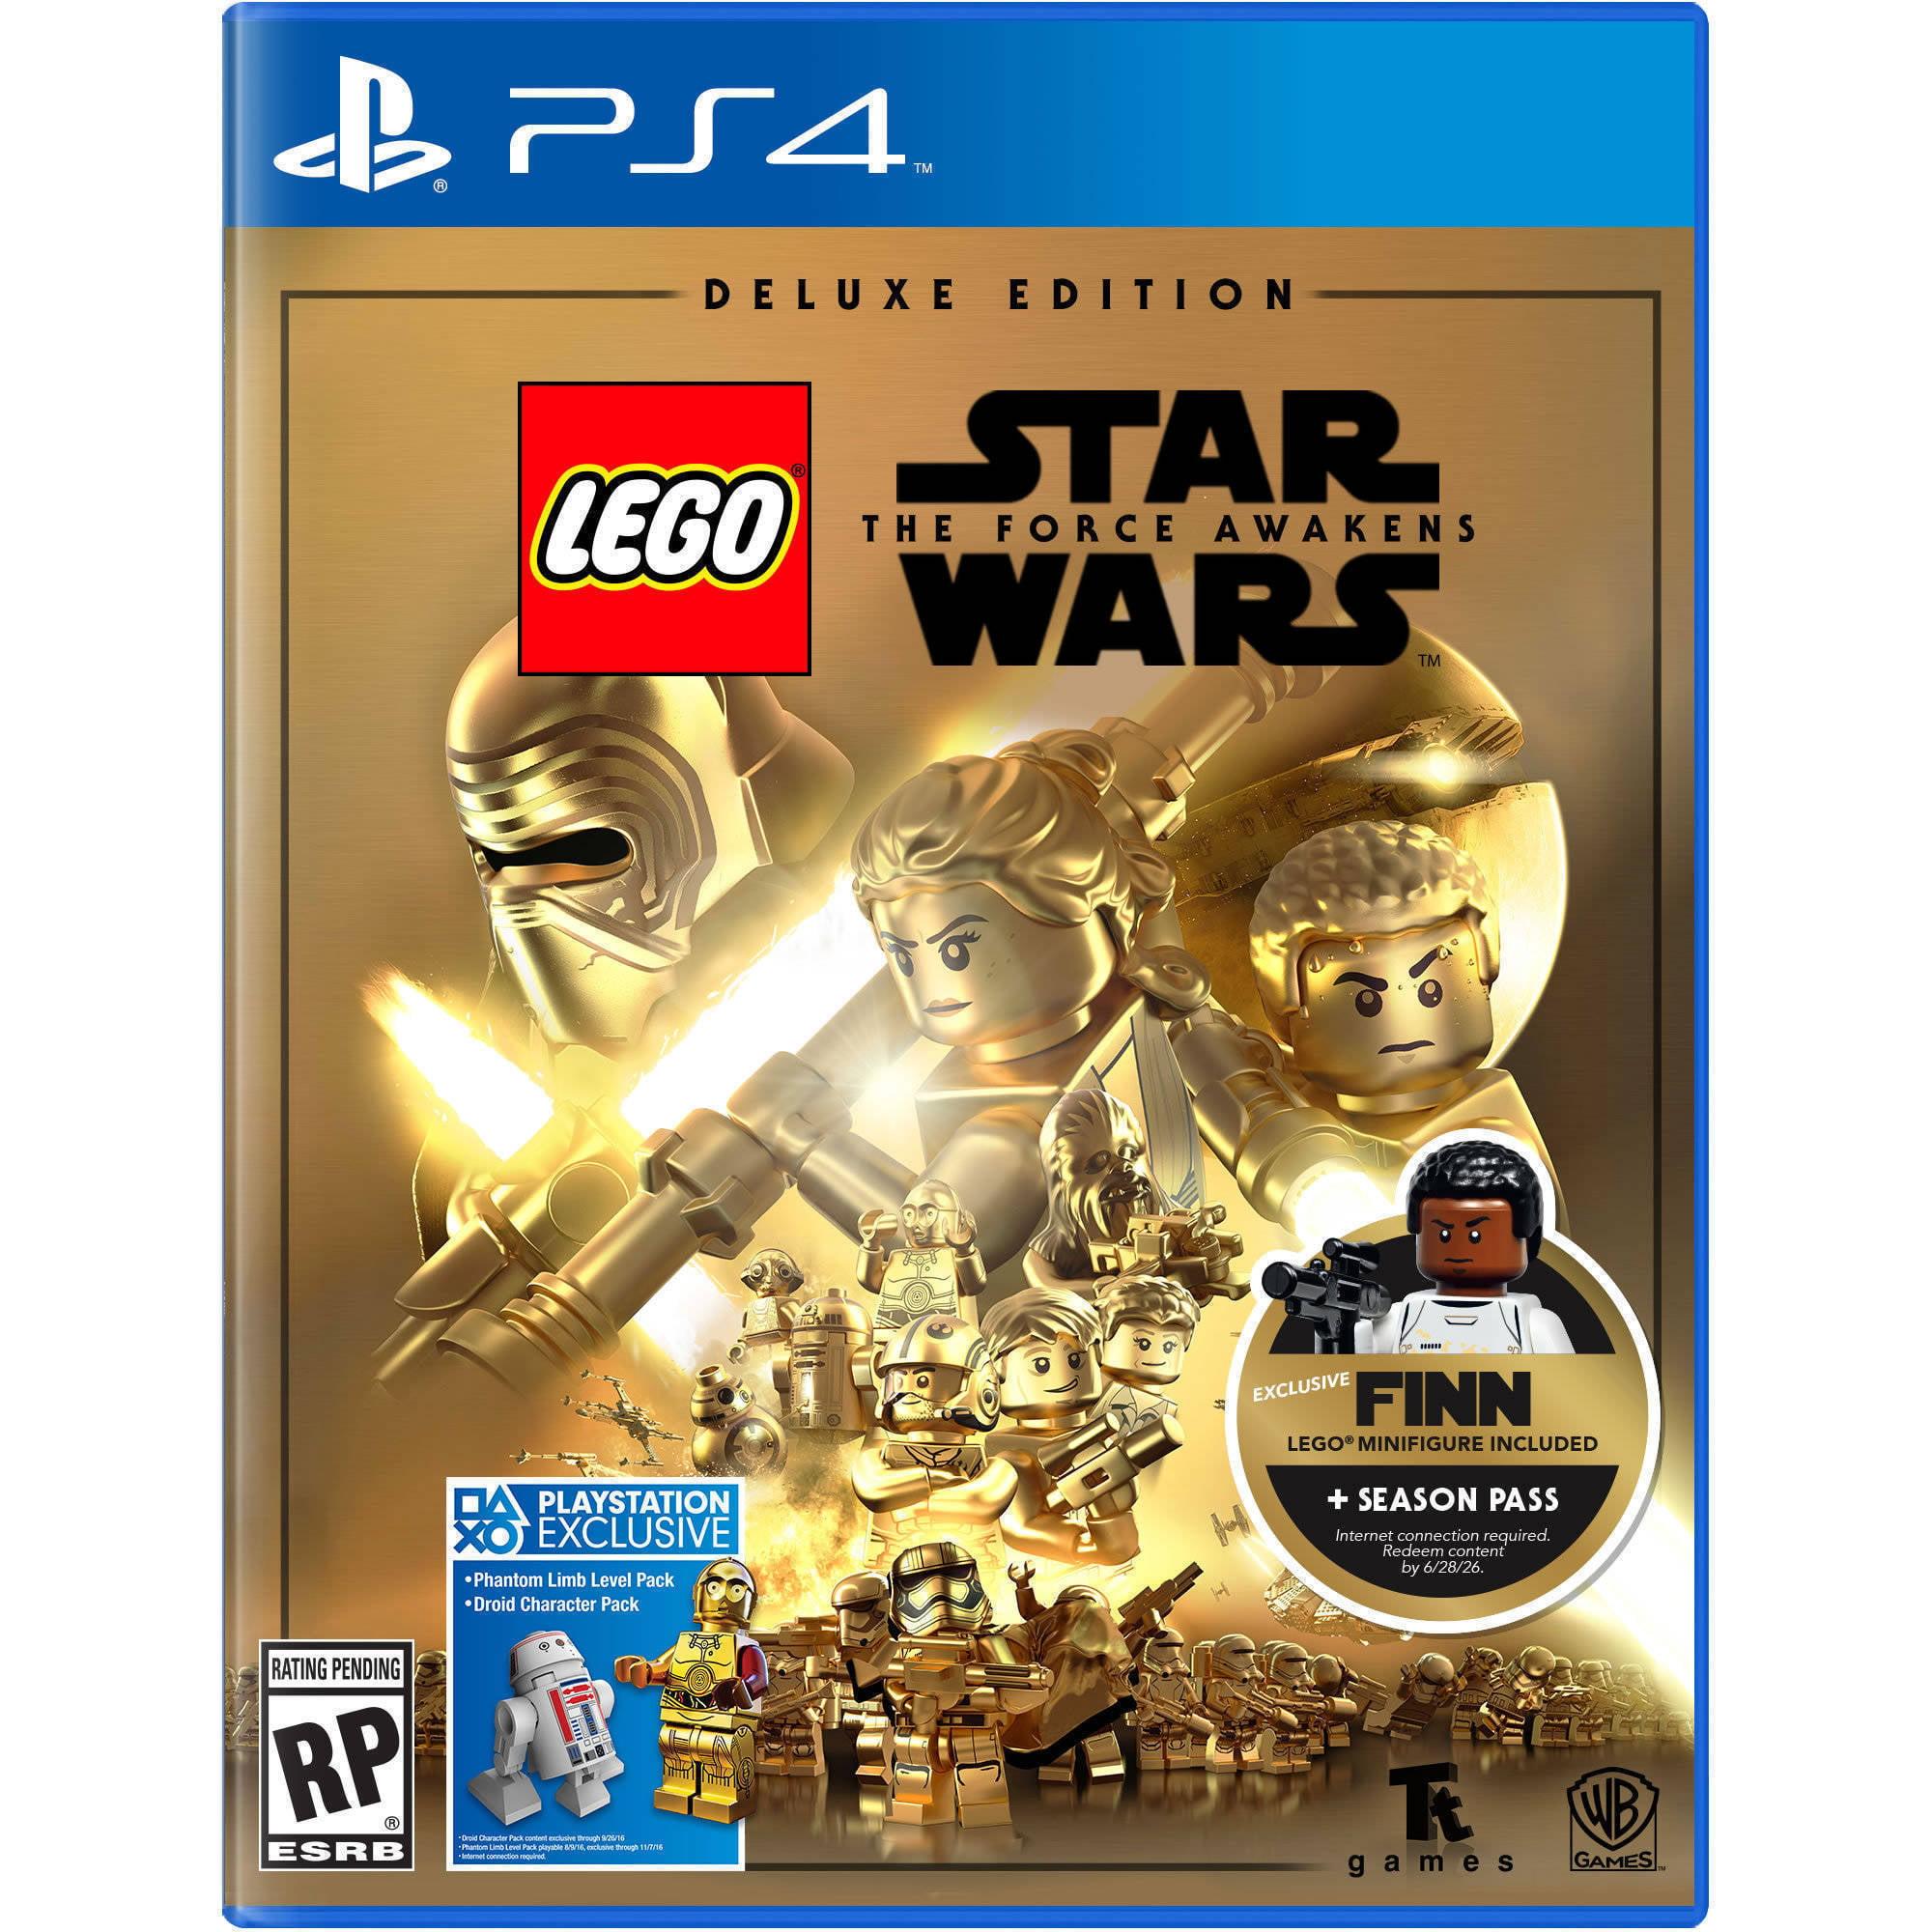 LEGO Star Wars Force Awakens Deluxe Edition - Walmart Exclusive (PS4)